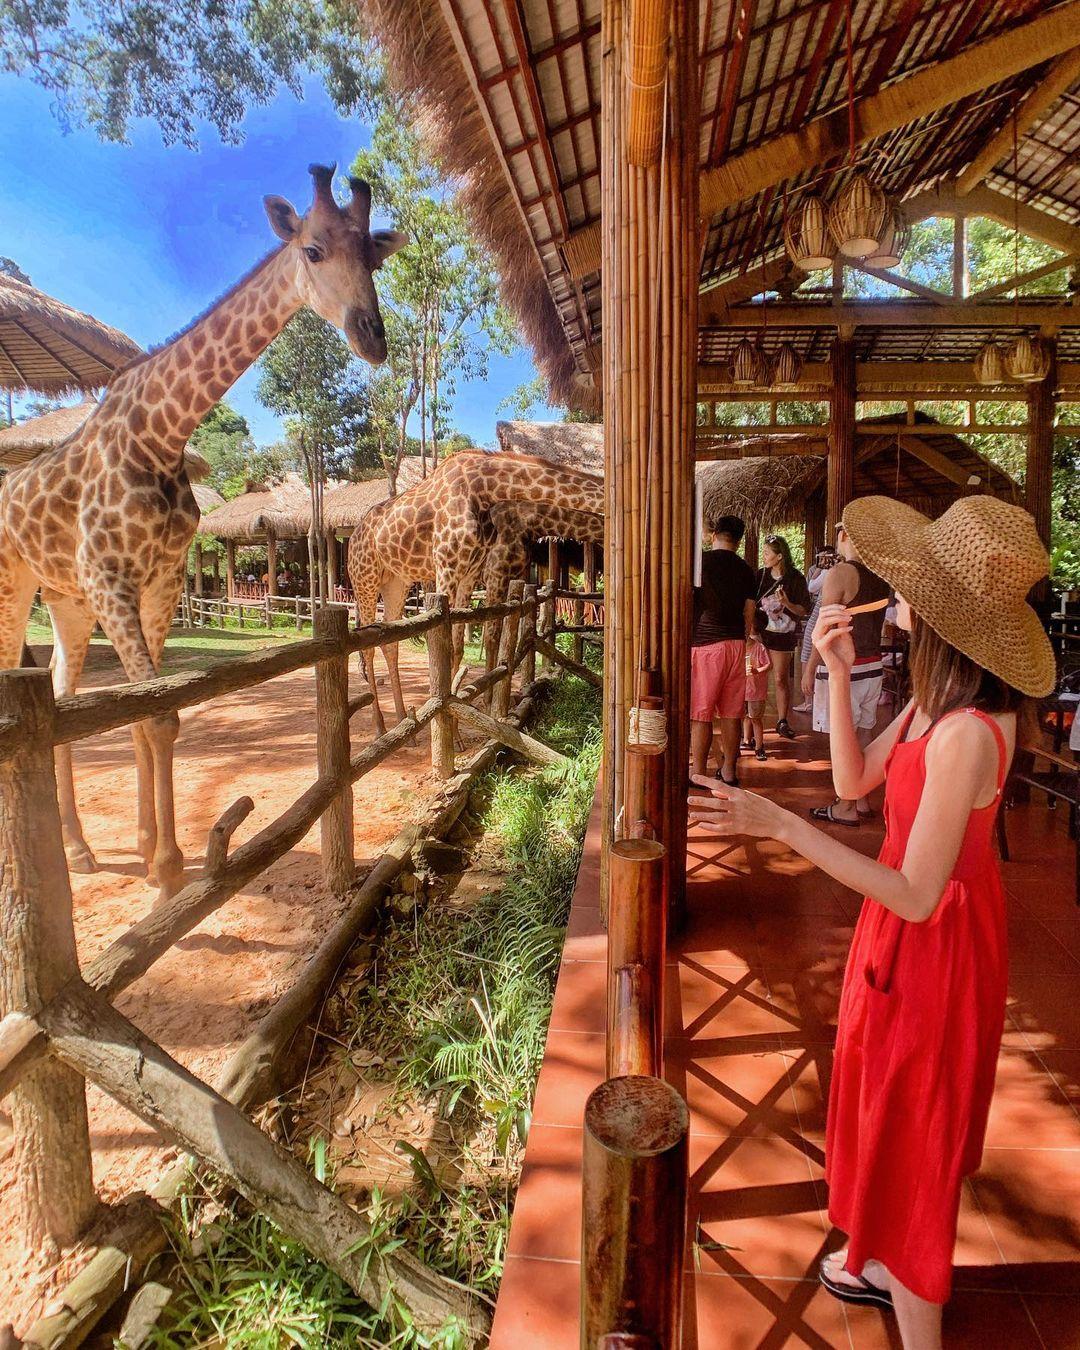 Vui chơi tại Vinpearl Safari. Hình: @wtifwtif